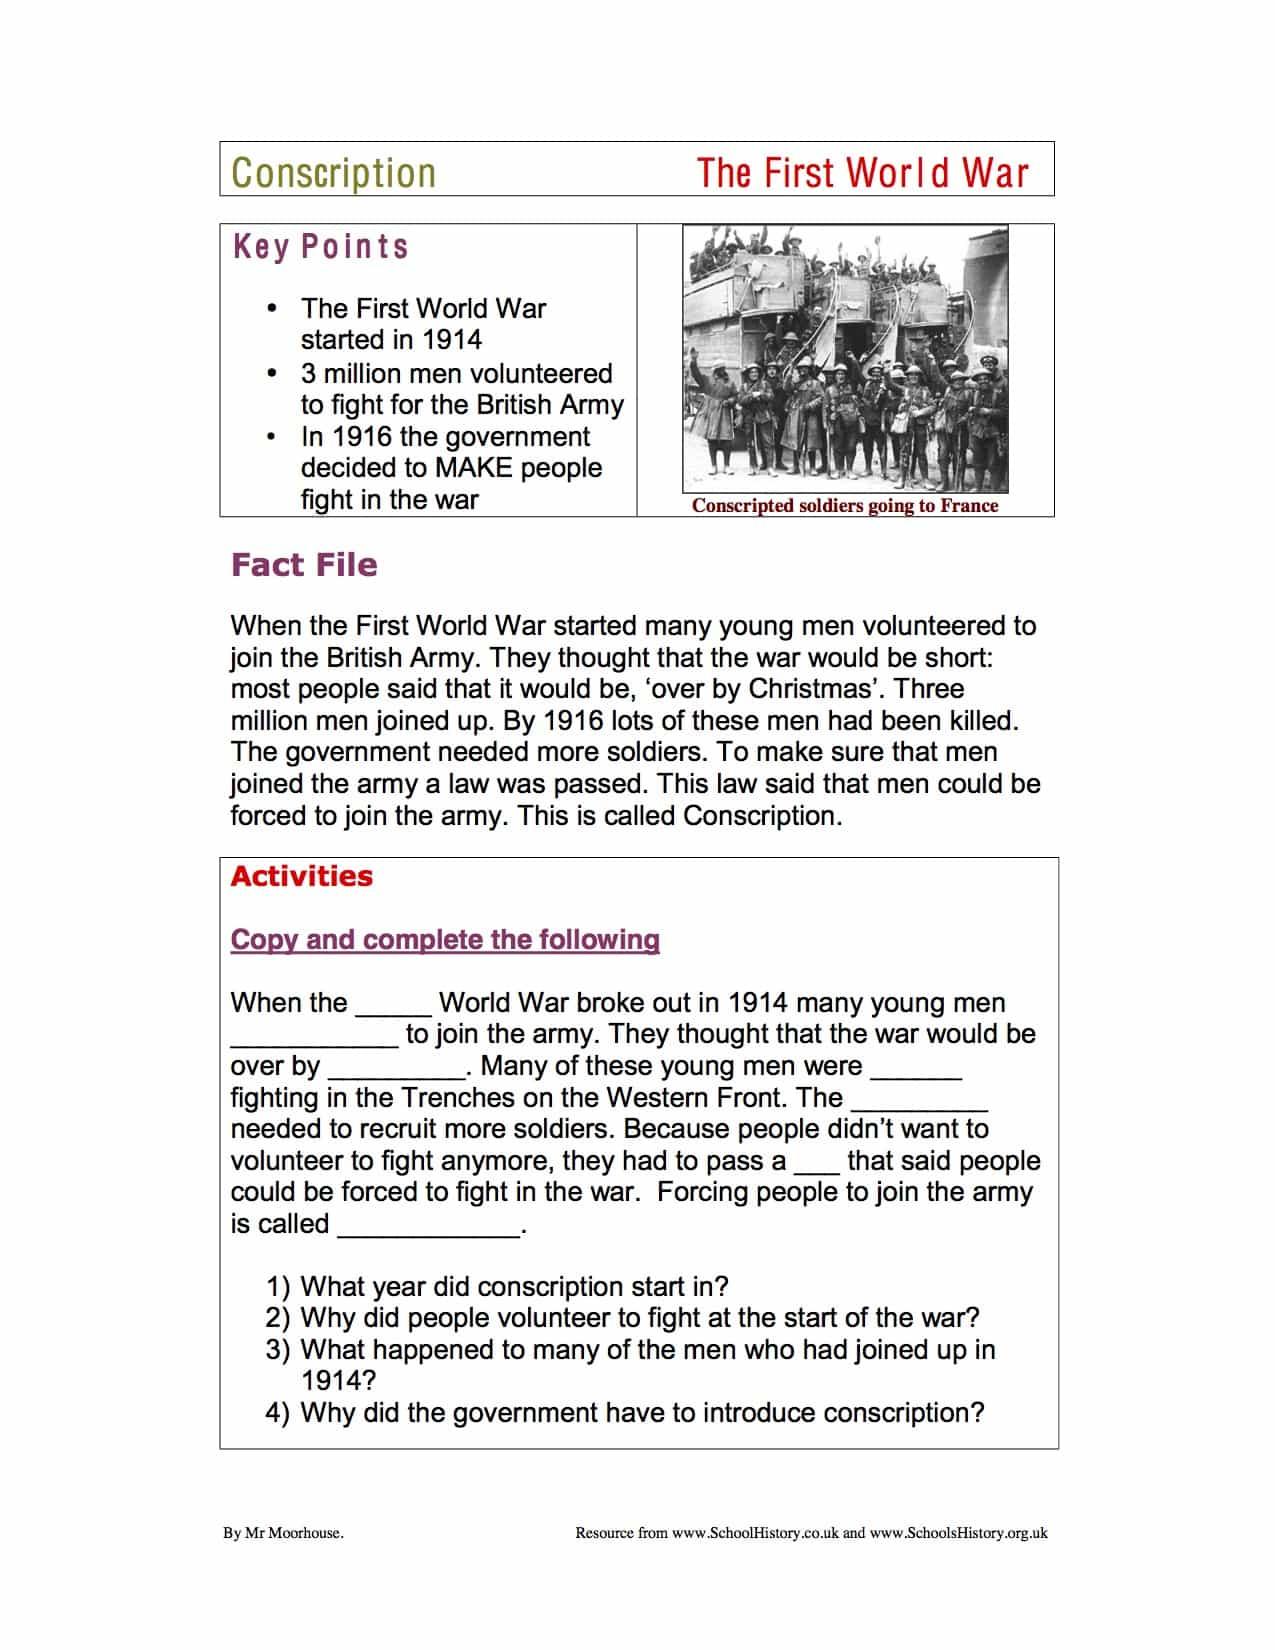 World War 1 Conscription Lower Facts